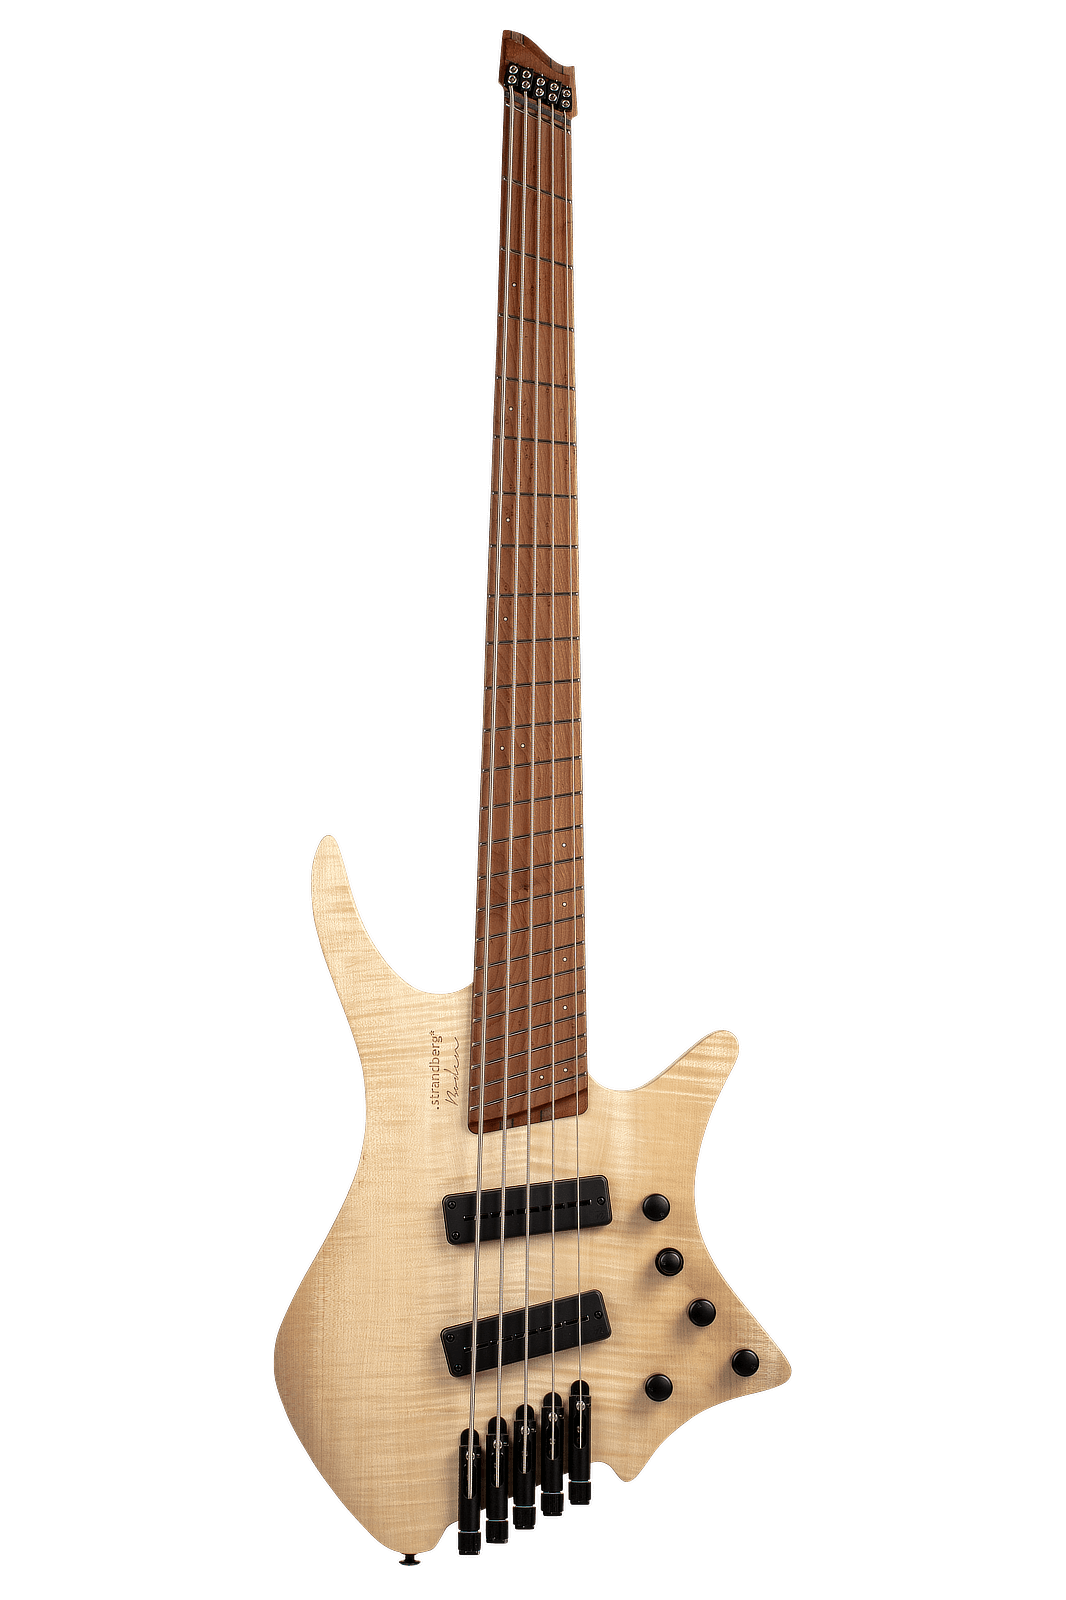 Headless Boden Bass 5-string natural front view